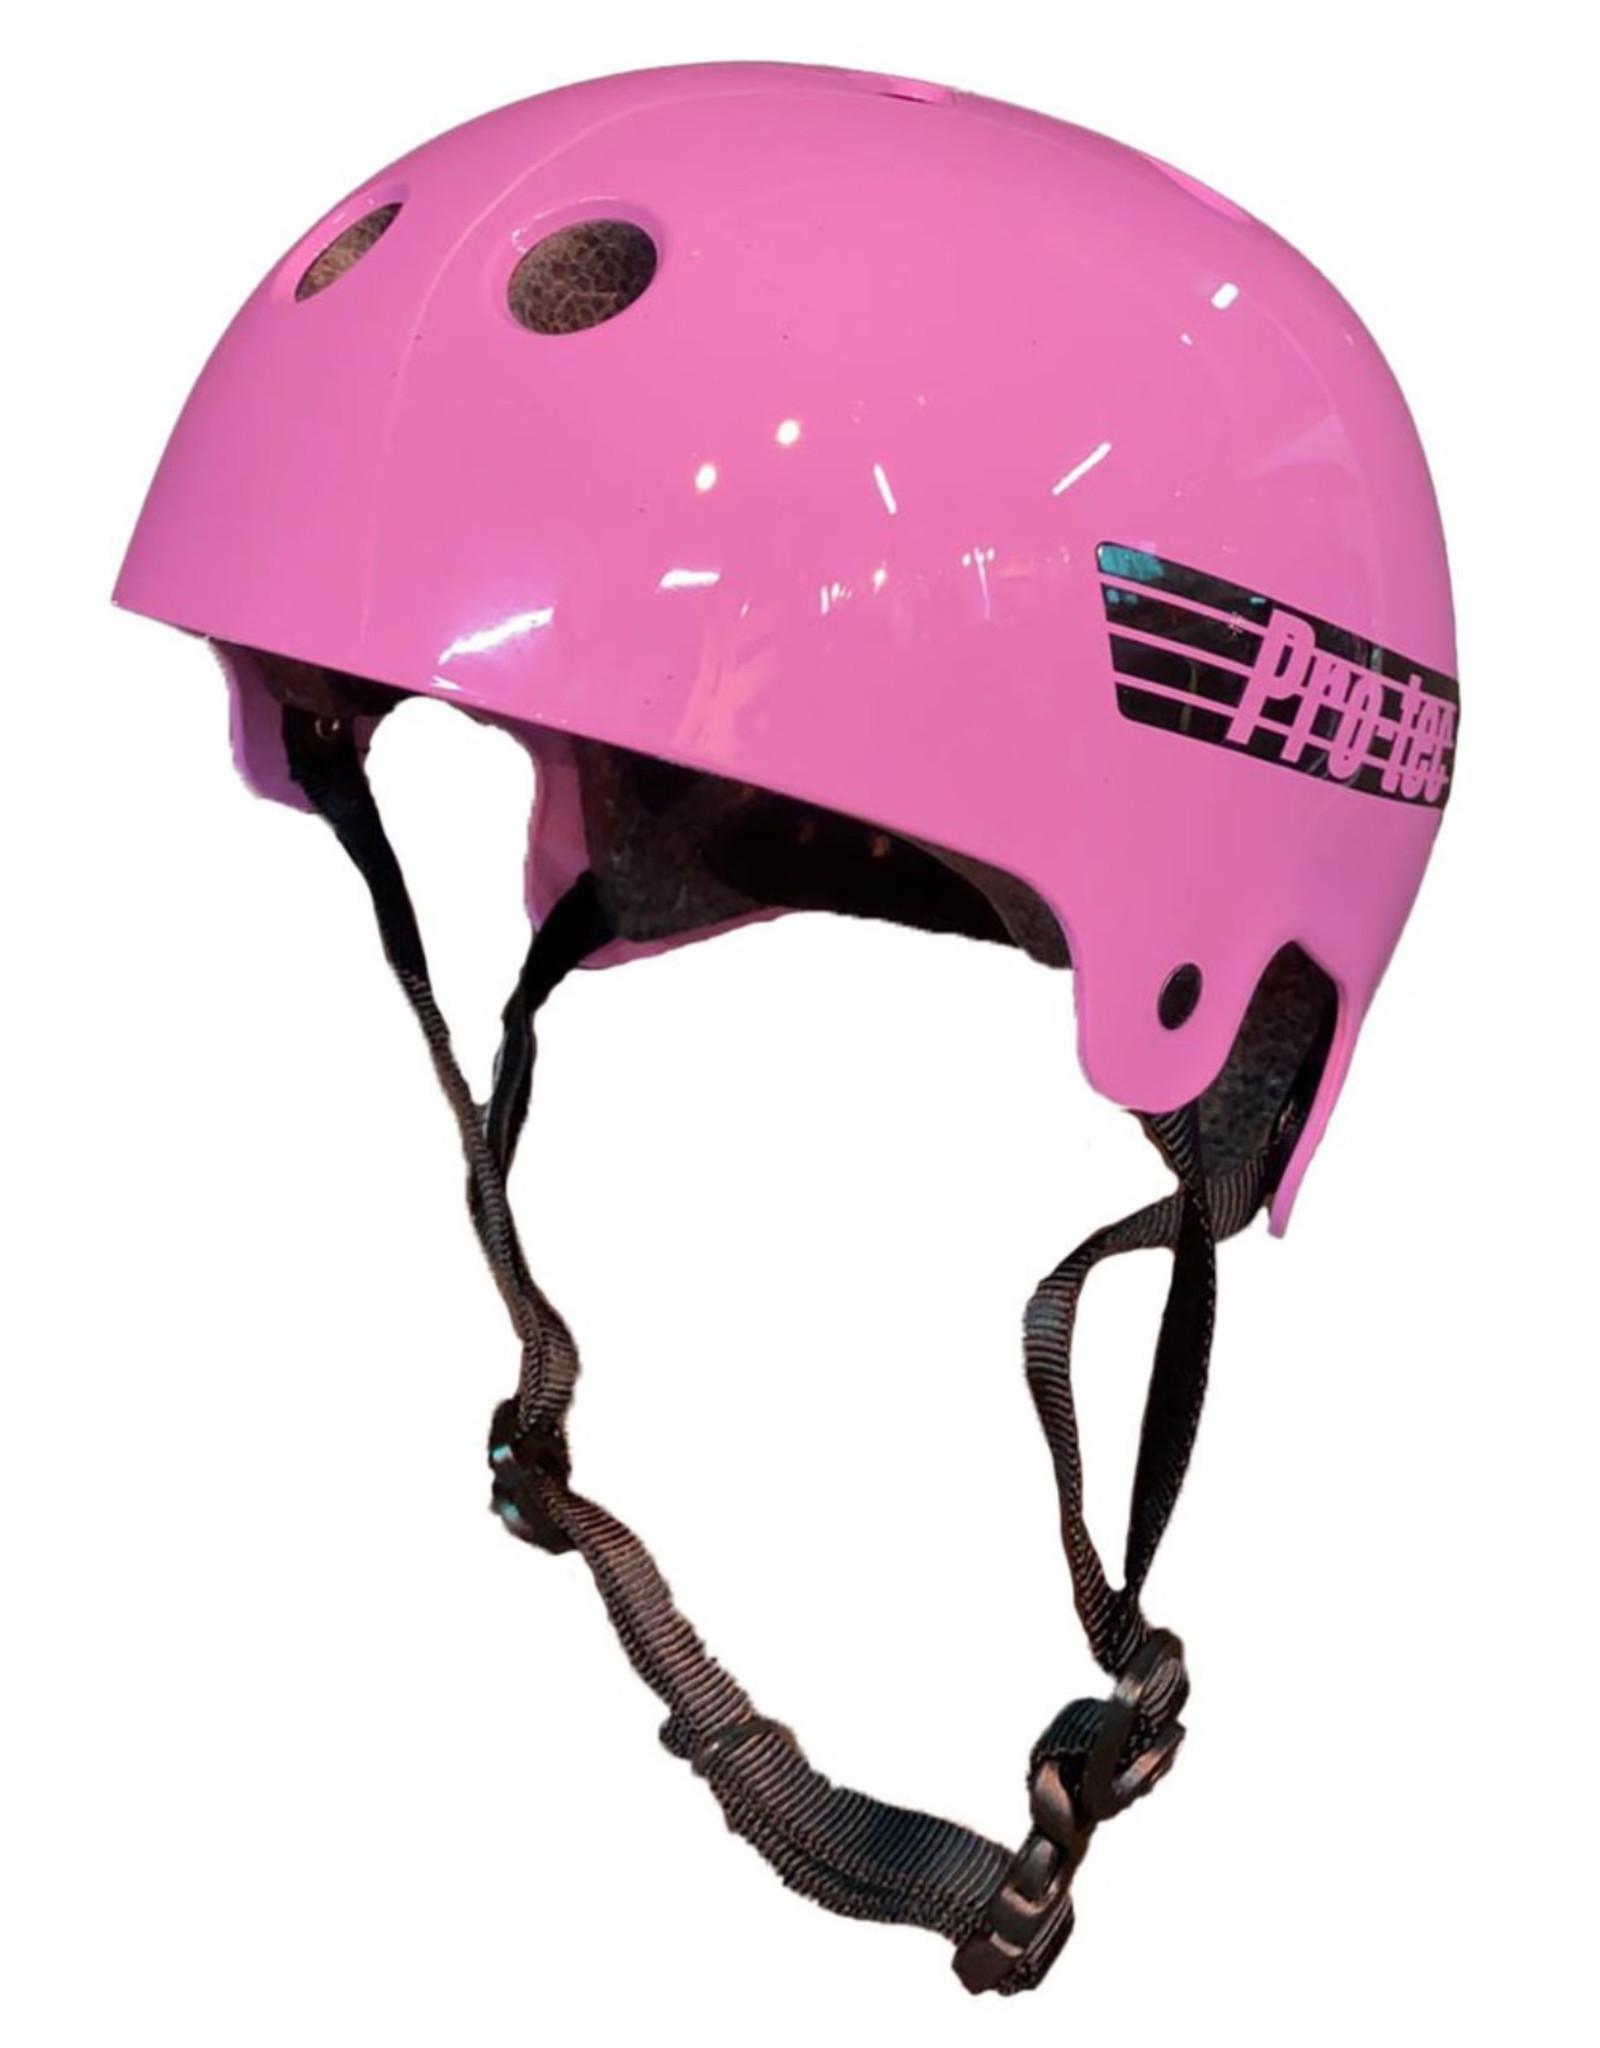 Pro-Tec Old School Skate Helmet